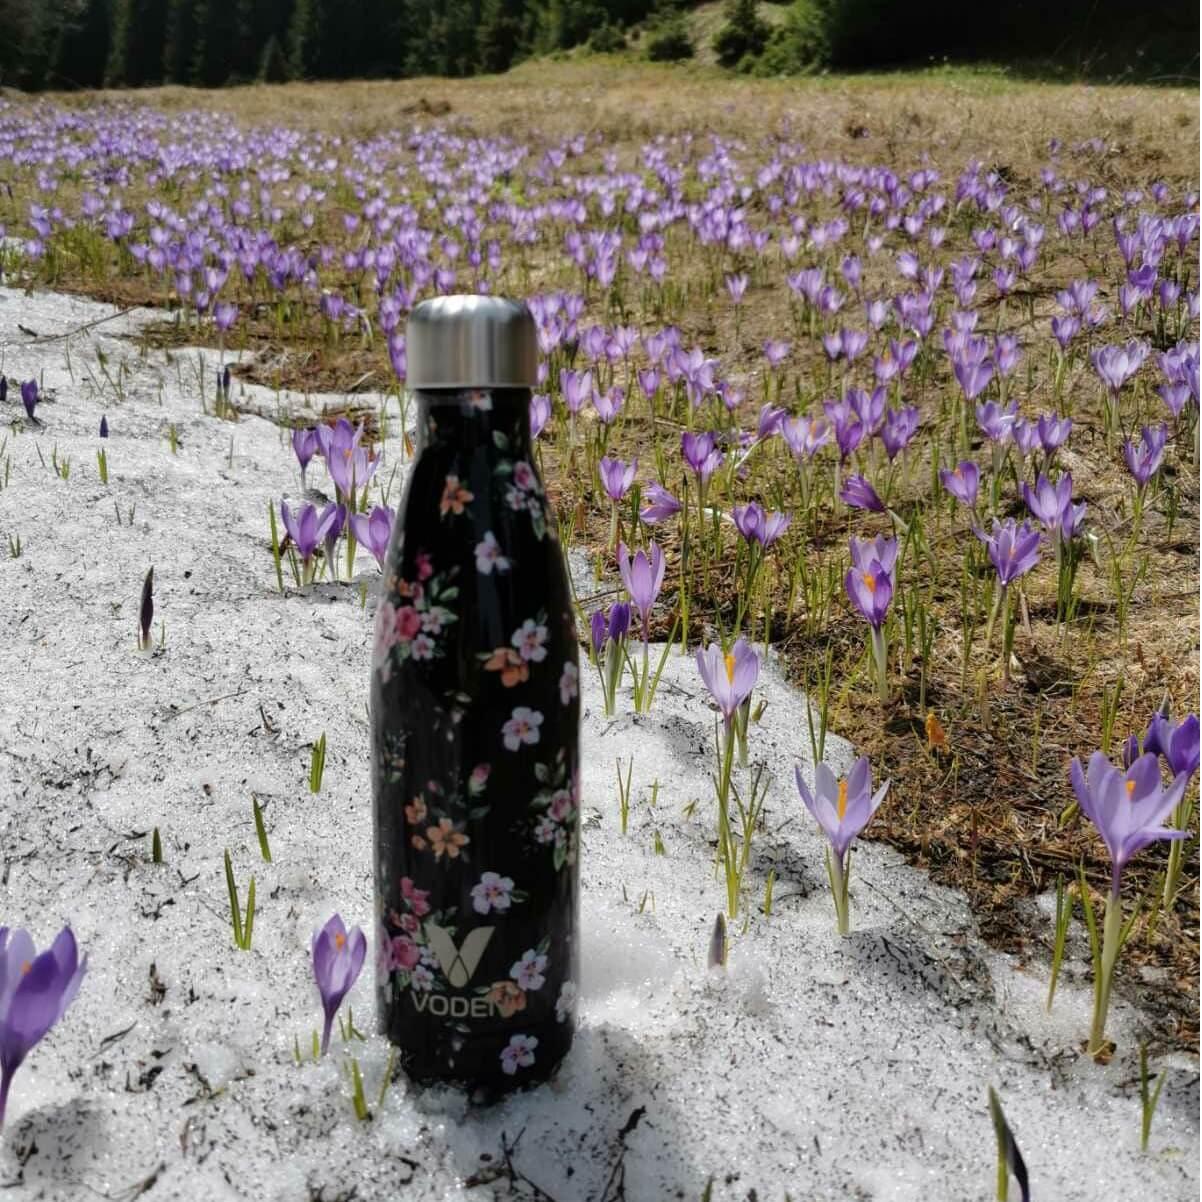 Voden flasica od nerdjajuceg celika cvetna